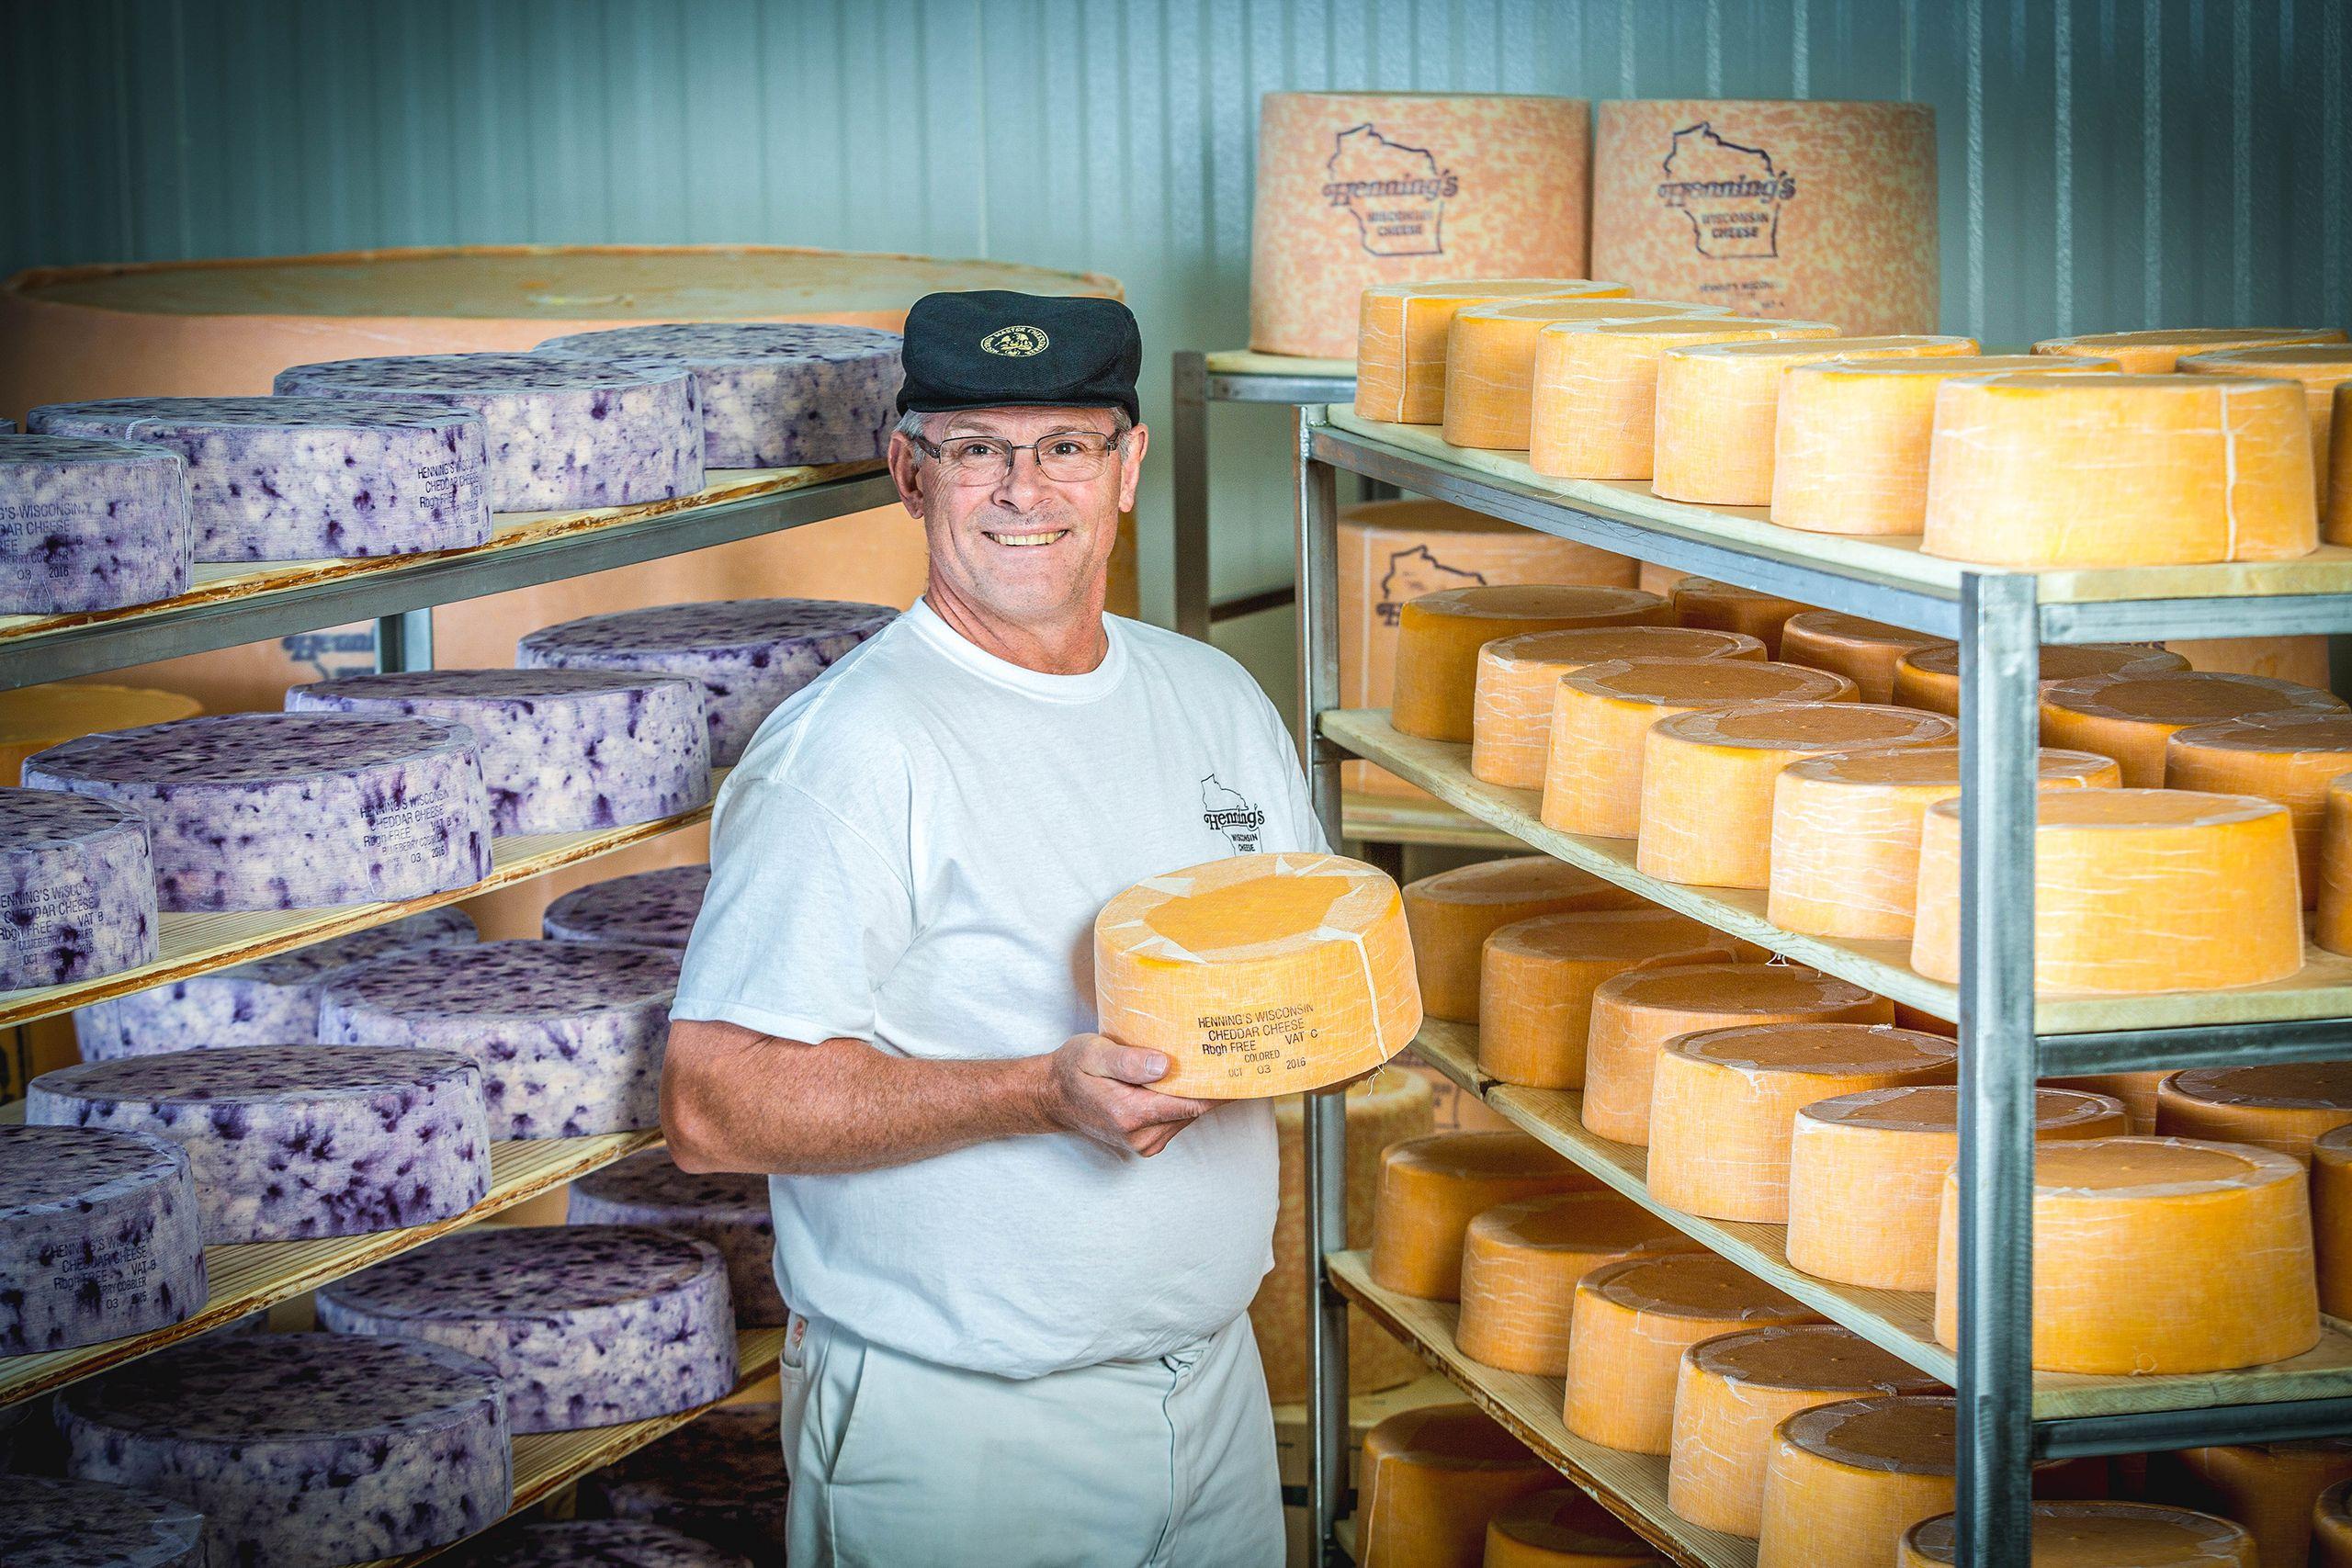 Cheese_Maker_8451.jpg